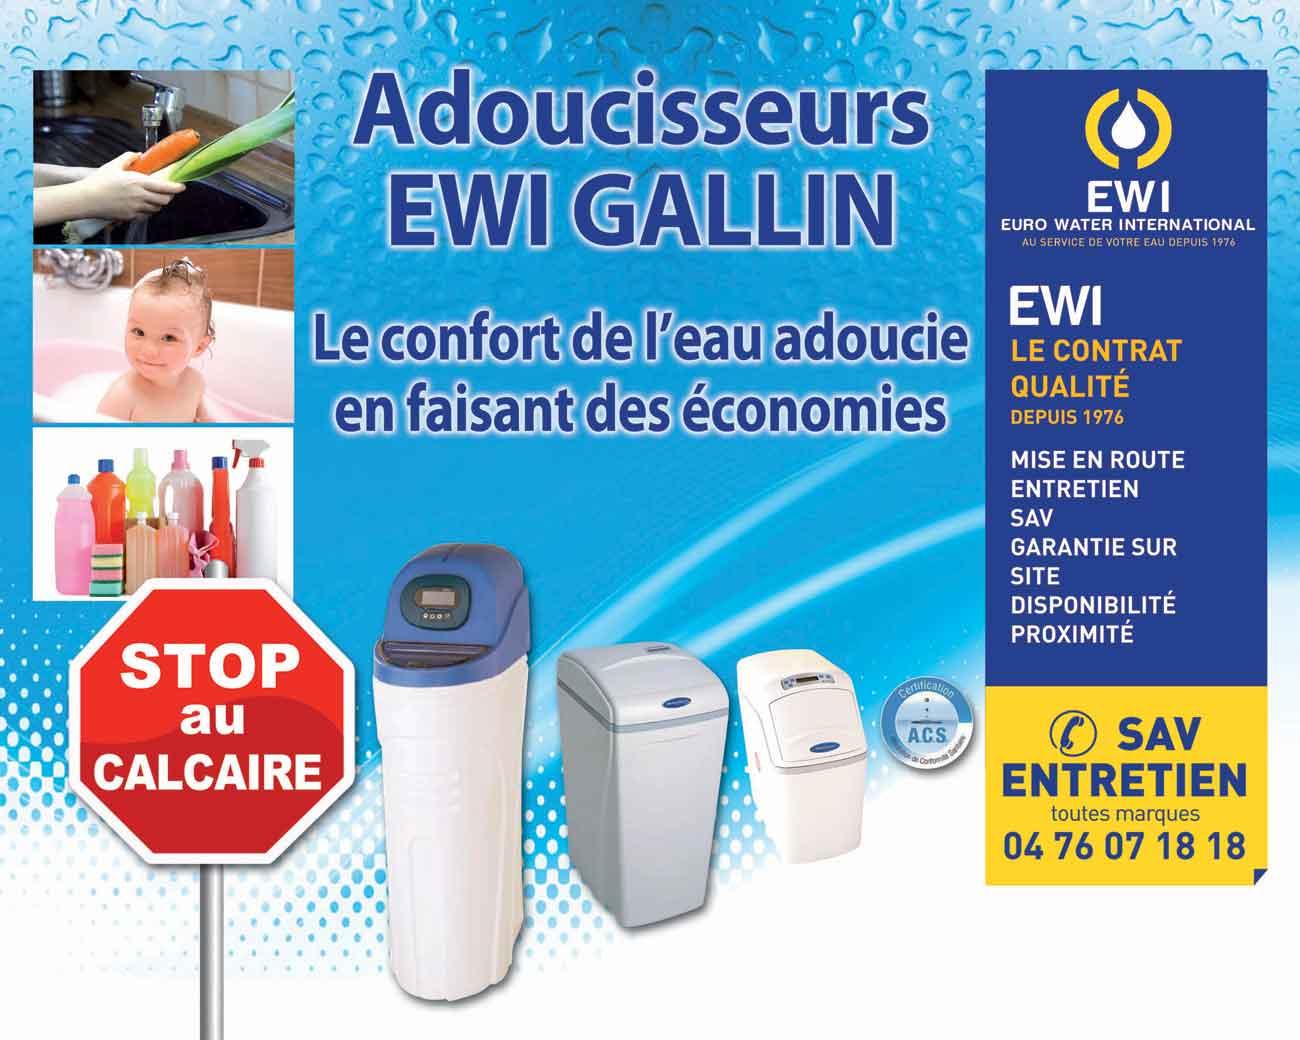 bache-EWI-ADOU-3000x2400-av